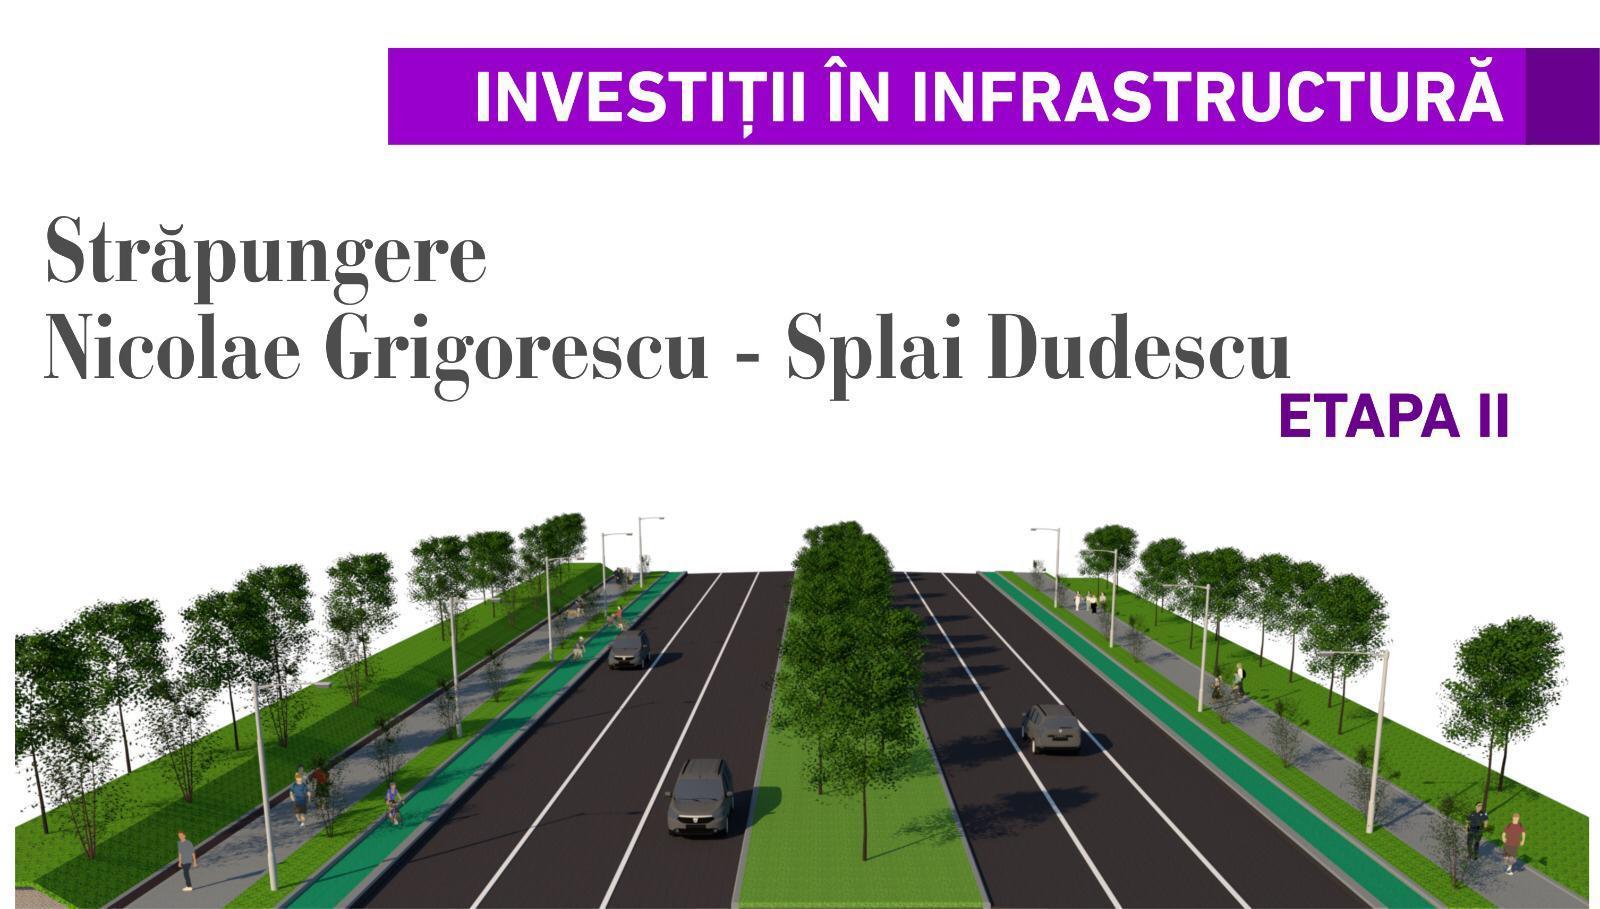 Străpungere Nicolae Grigorescu - Splai Dudescu. Etapa II.